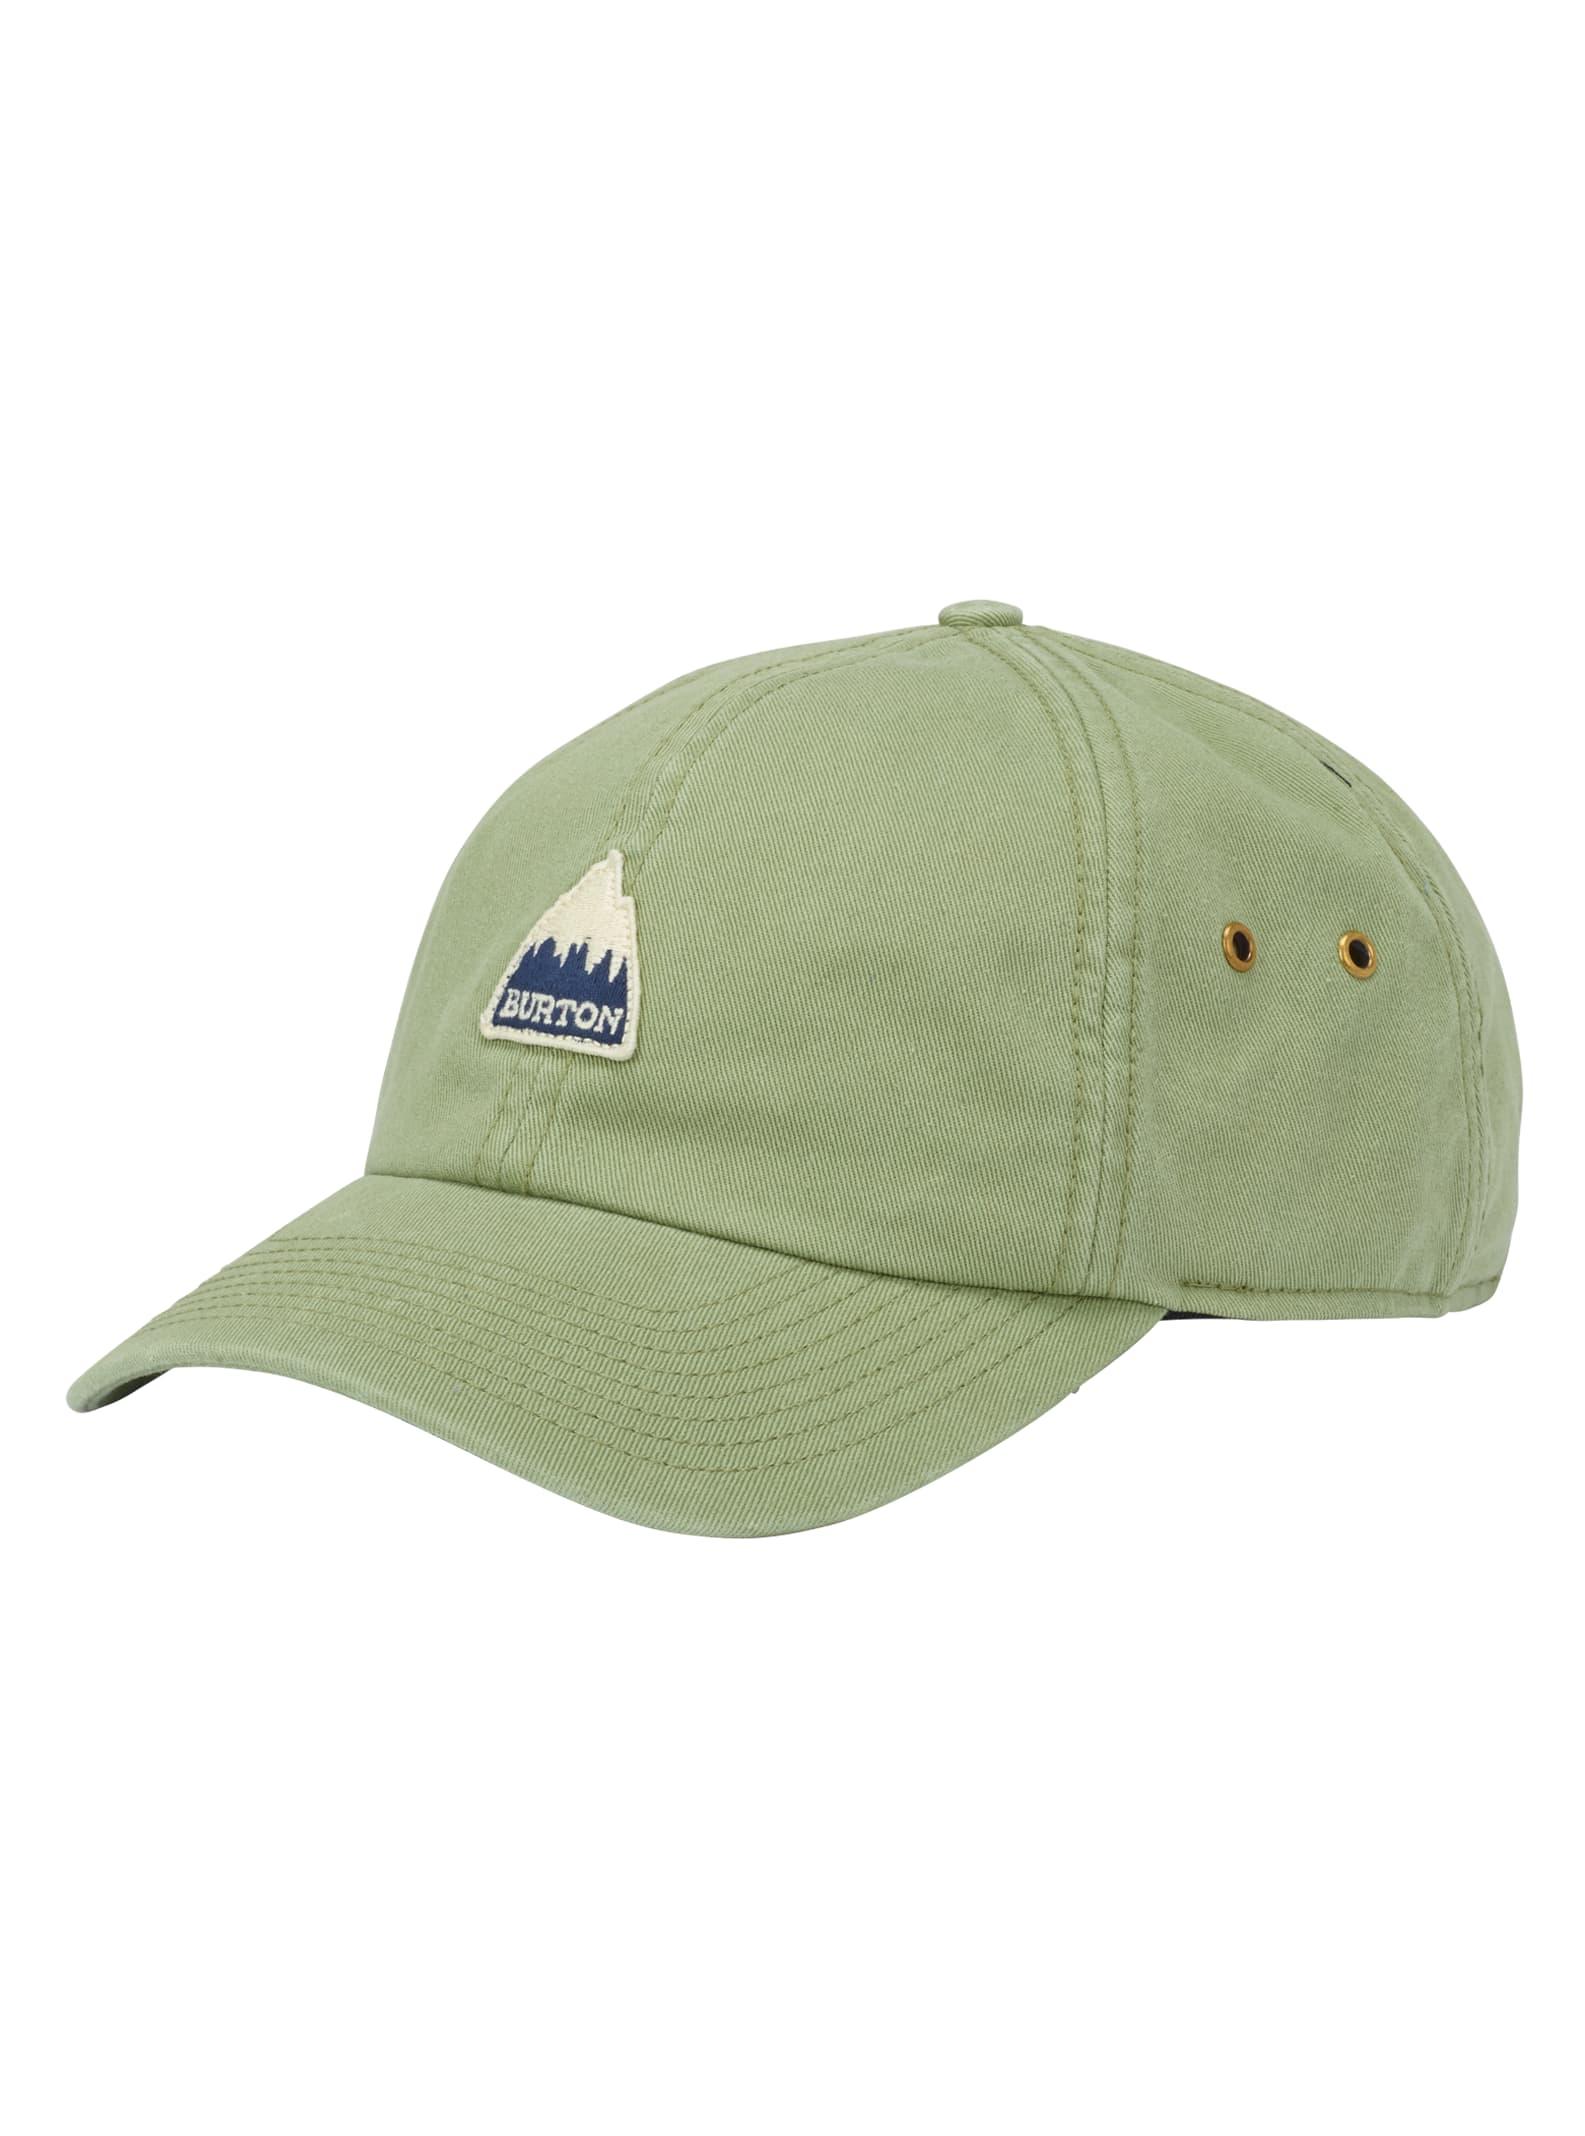 d6b9840107d36 Burton Rad Dad Hat